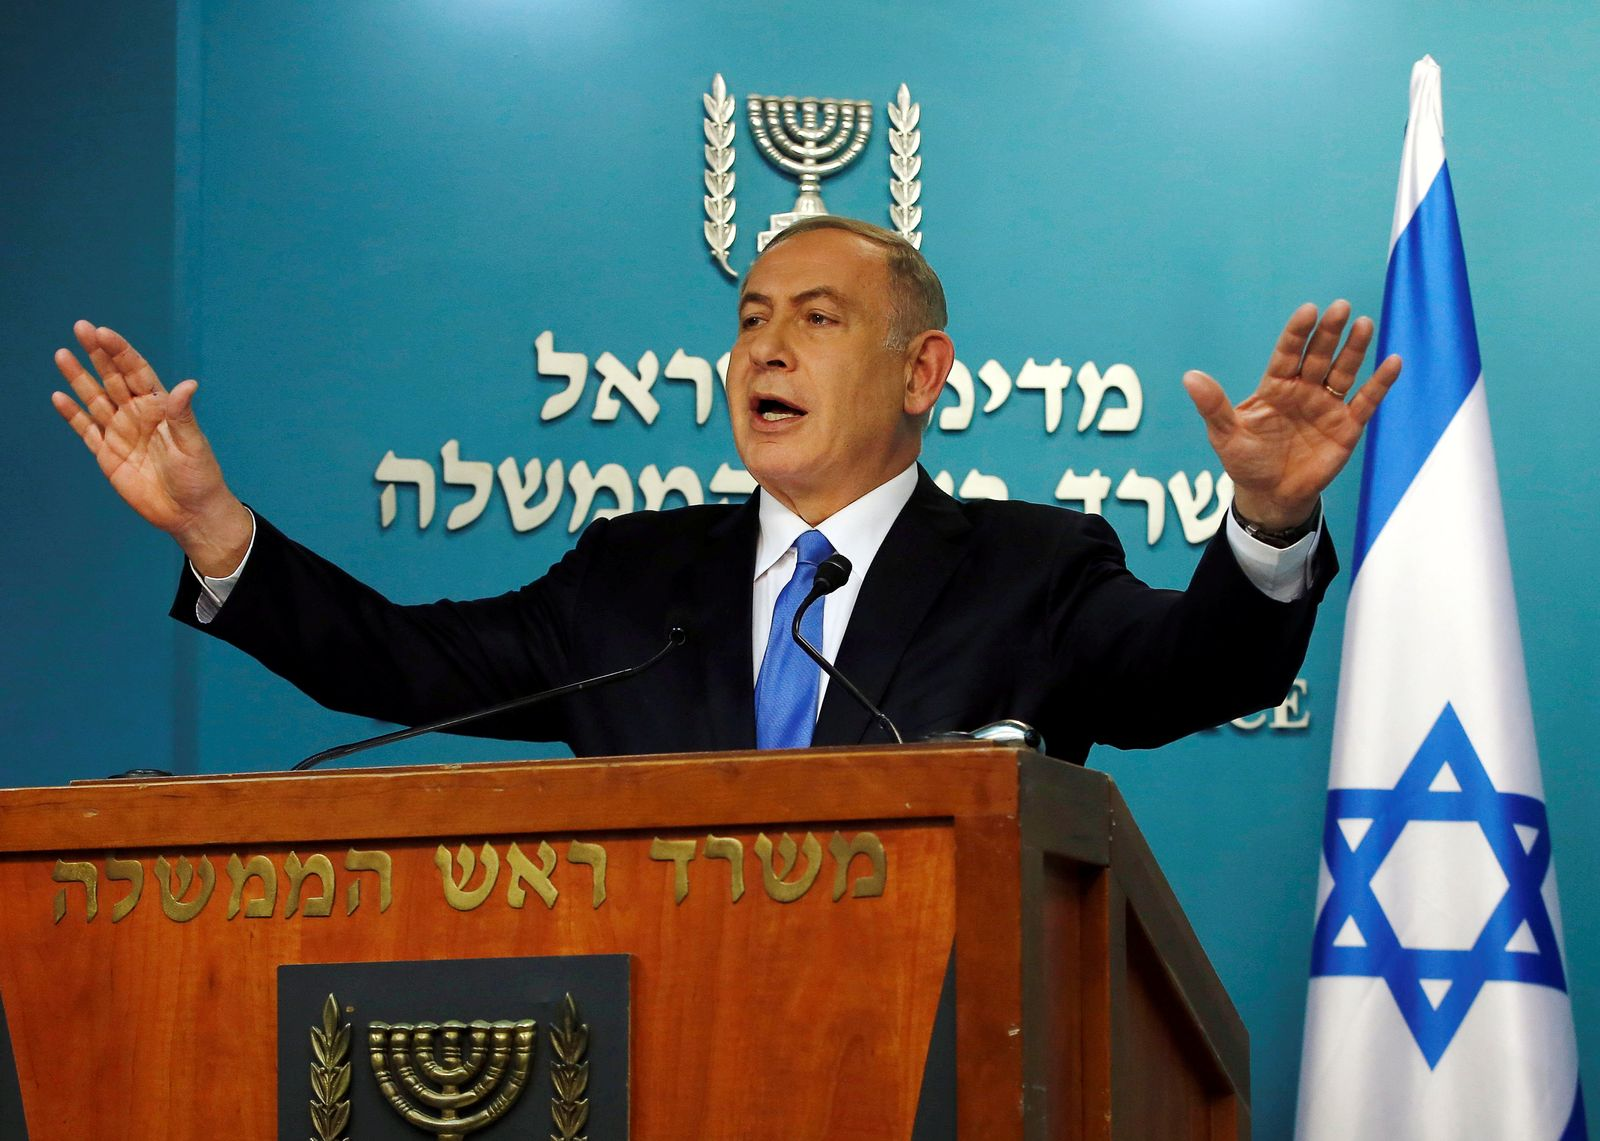 ISRAEL-PALESTINIANS/KERRY